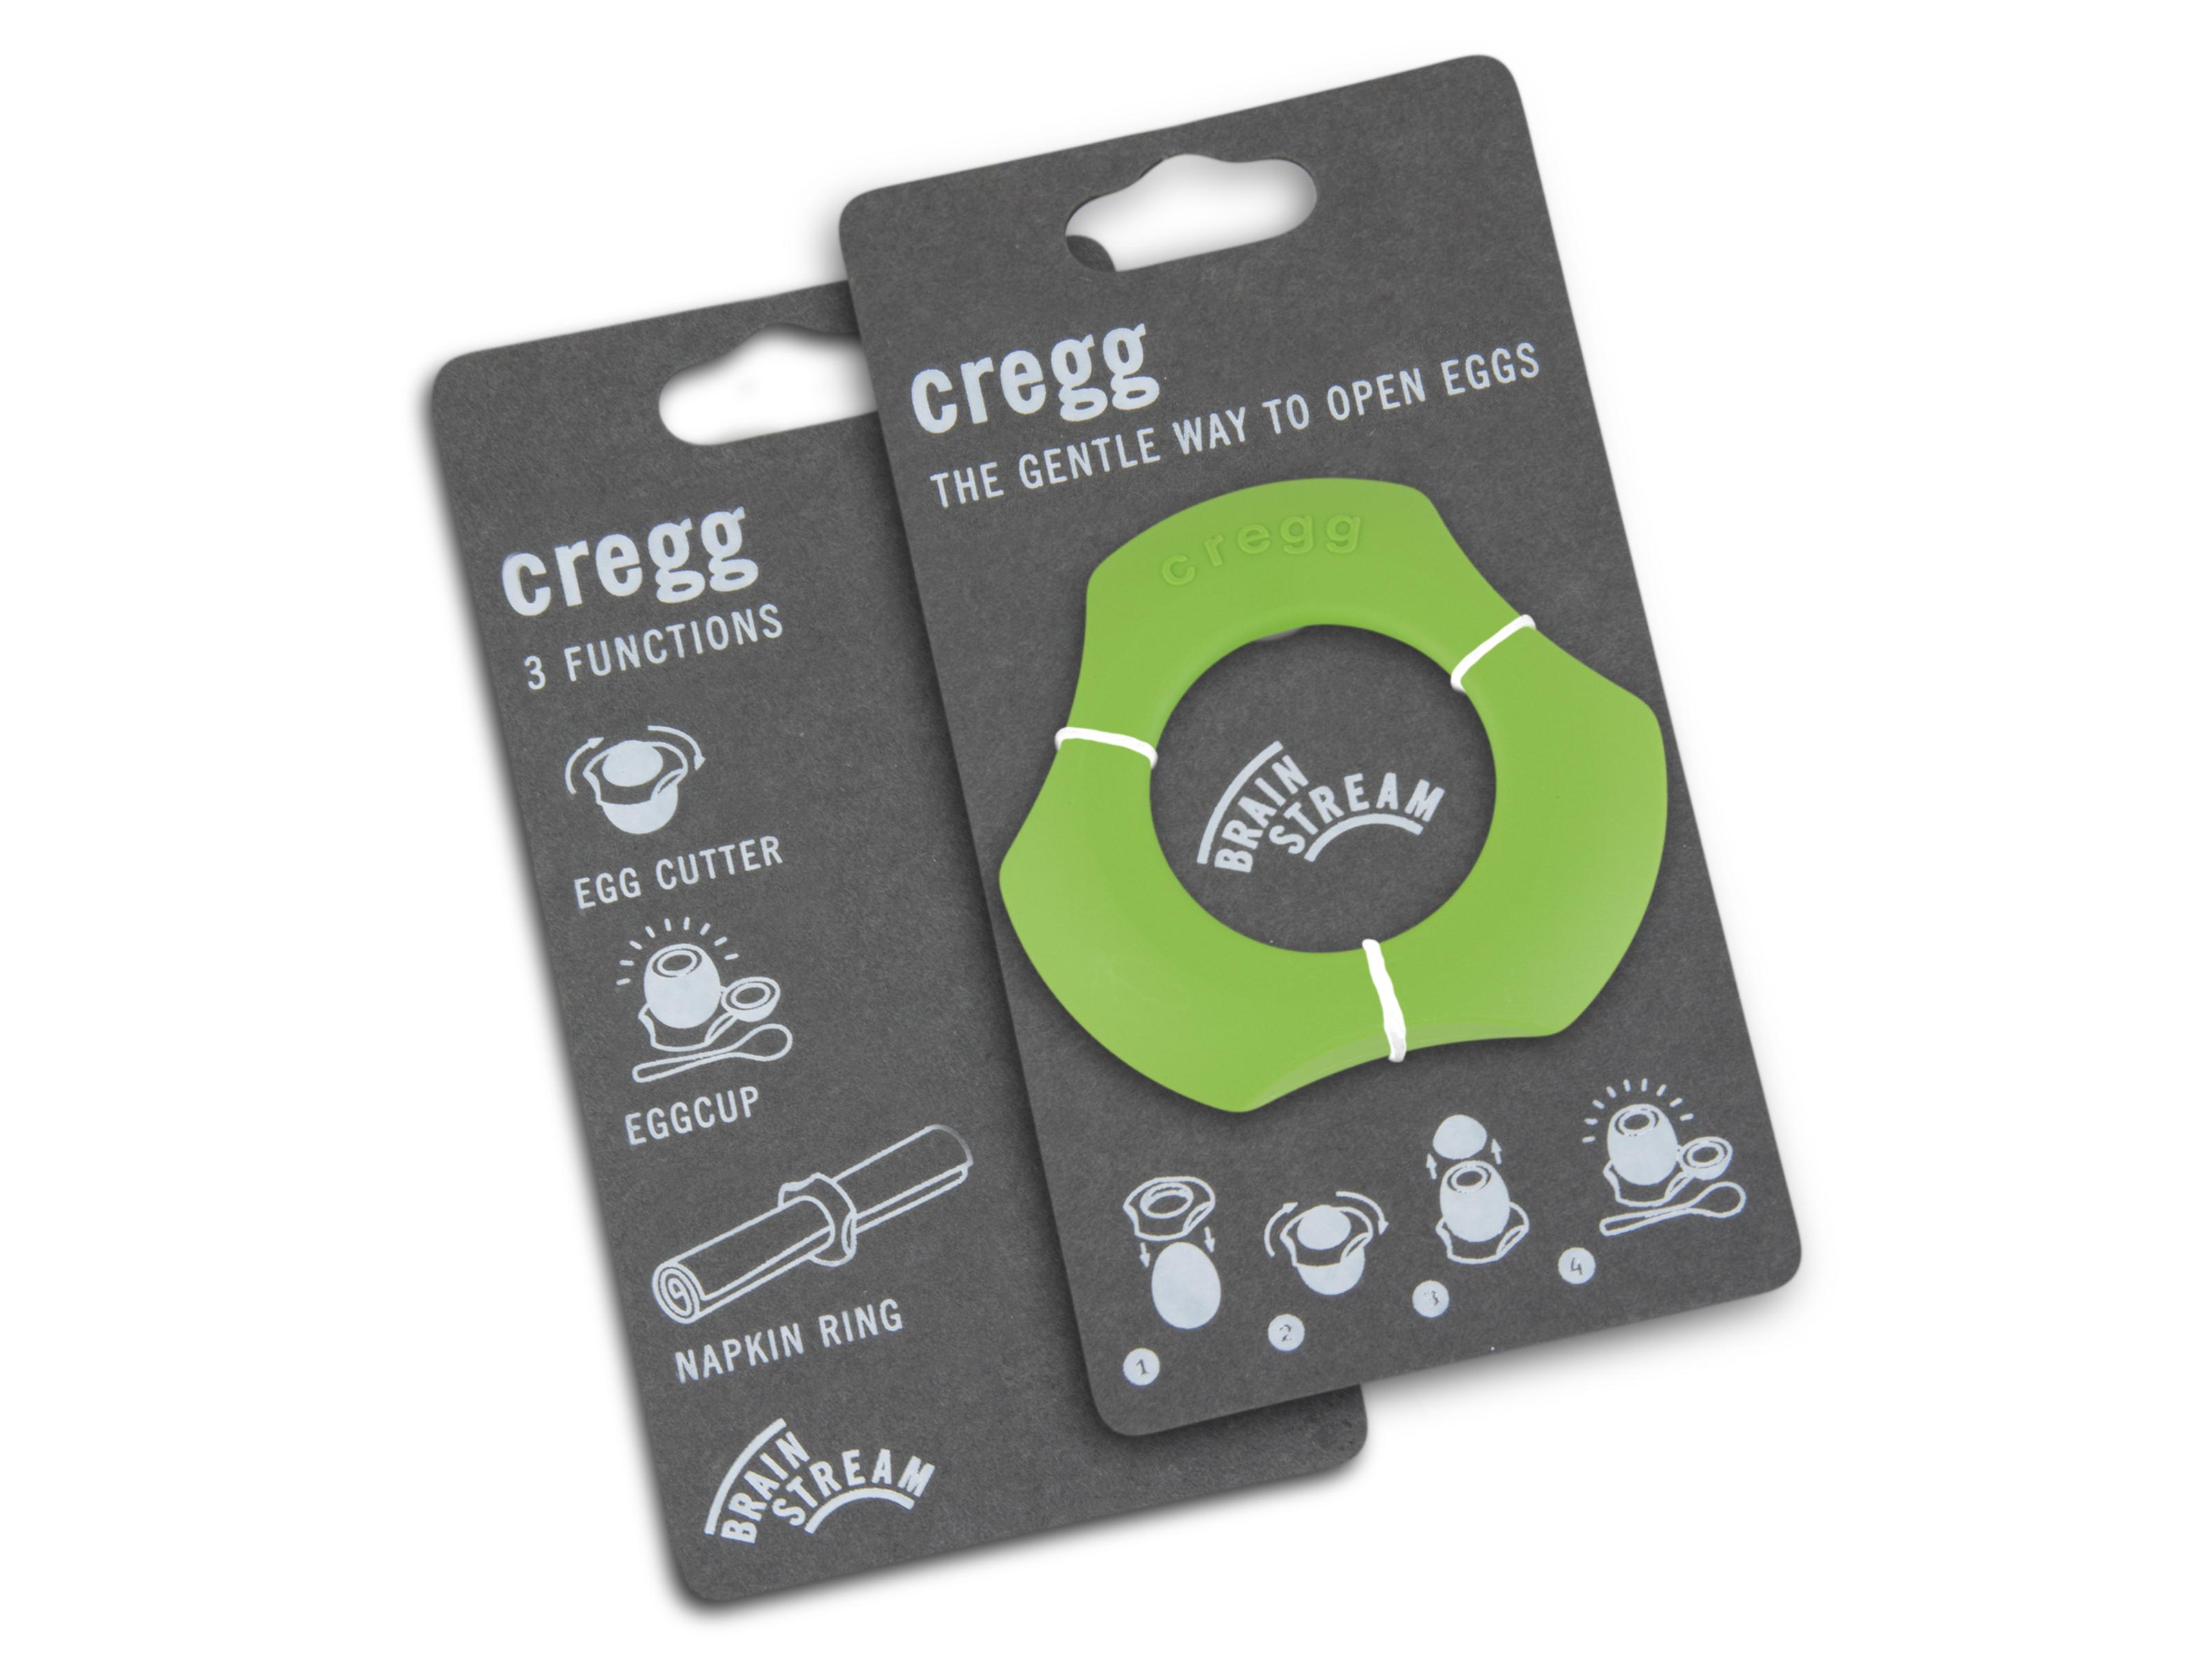 Cregg A001274 Single Pack & Eggshell Cutter Eggcup Napkin Ring, Lime